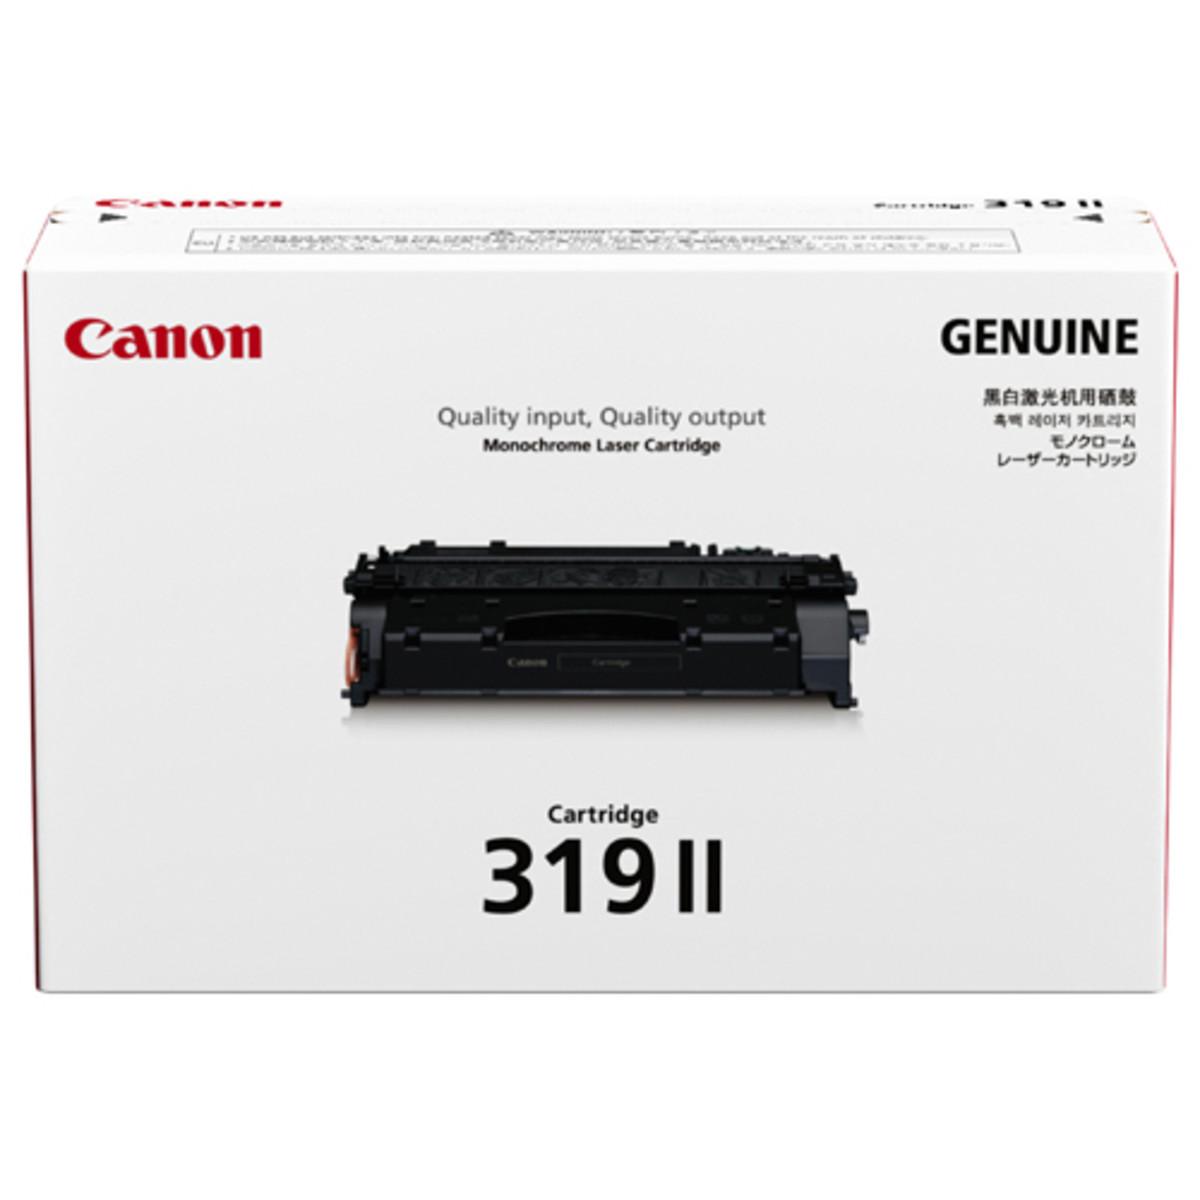 Canon CART-319II Black Toner Cartridge - High Yield